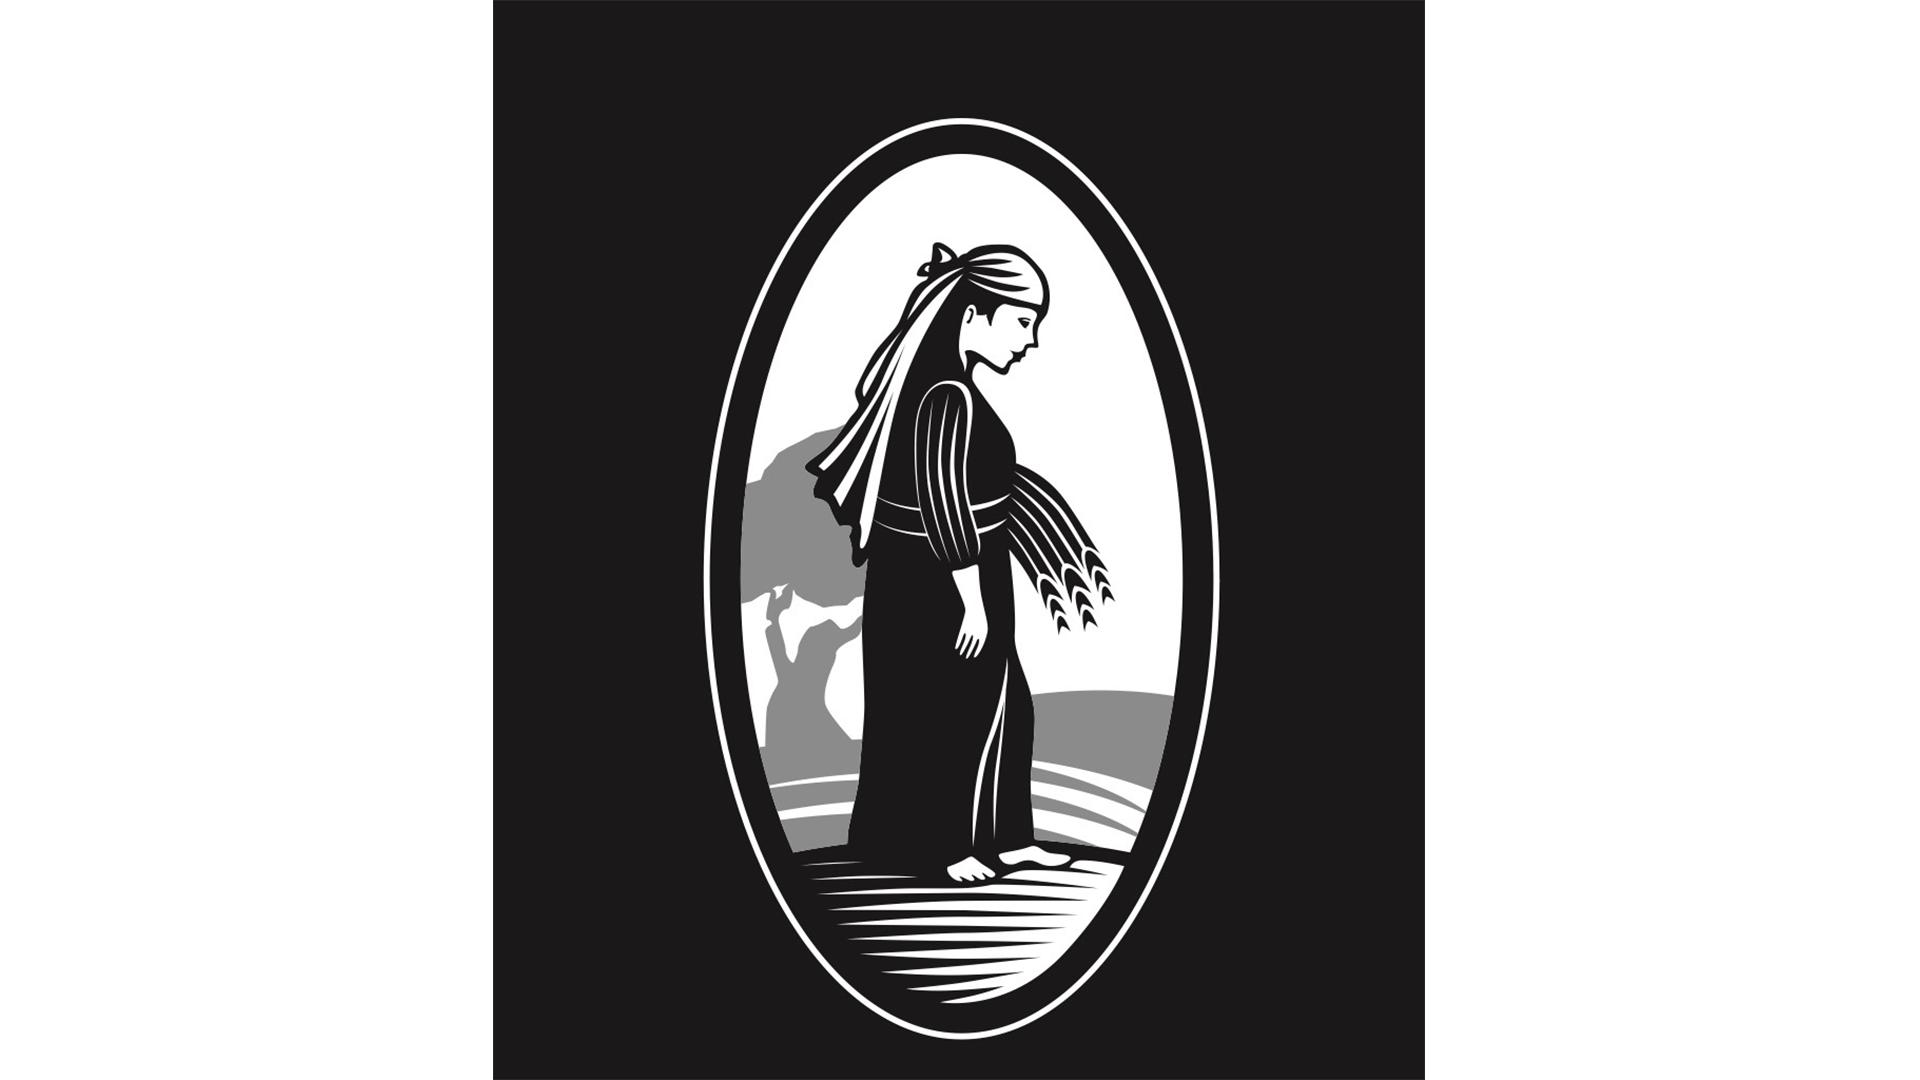 widows harvest ministries logo - Widows Harvest.jpg